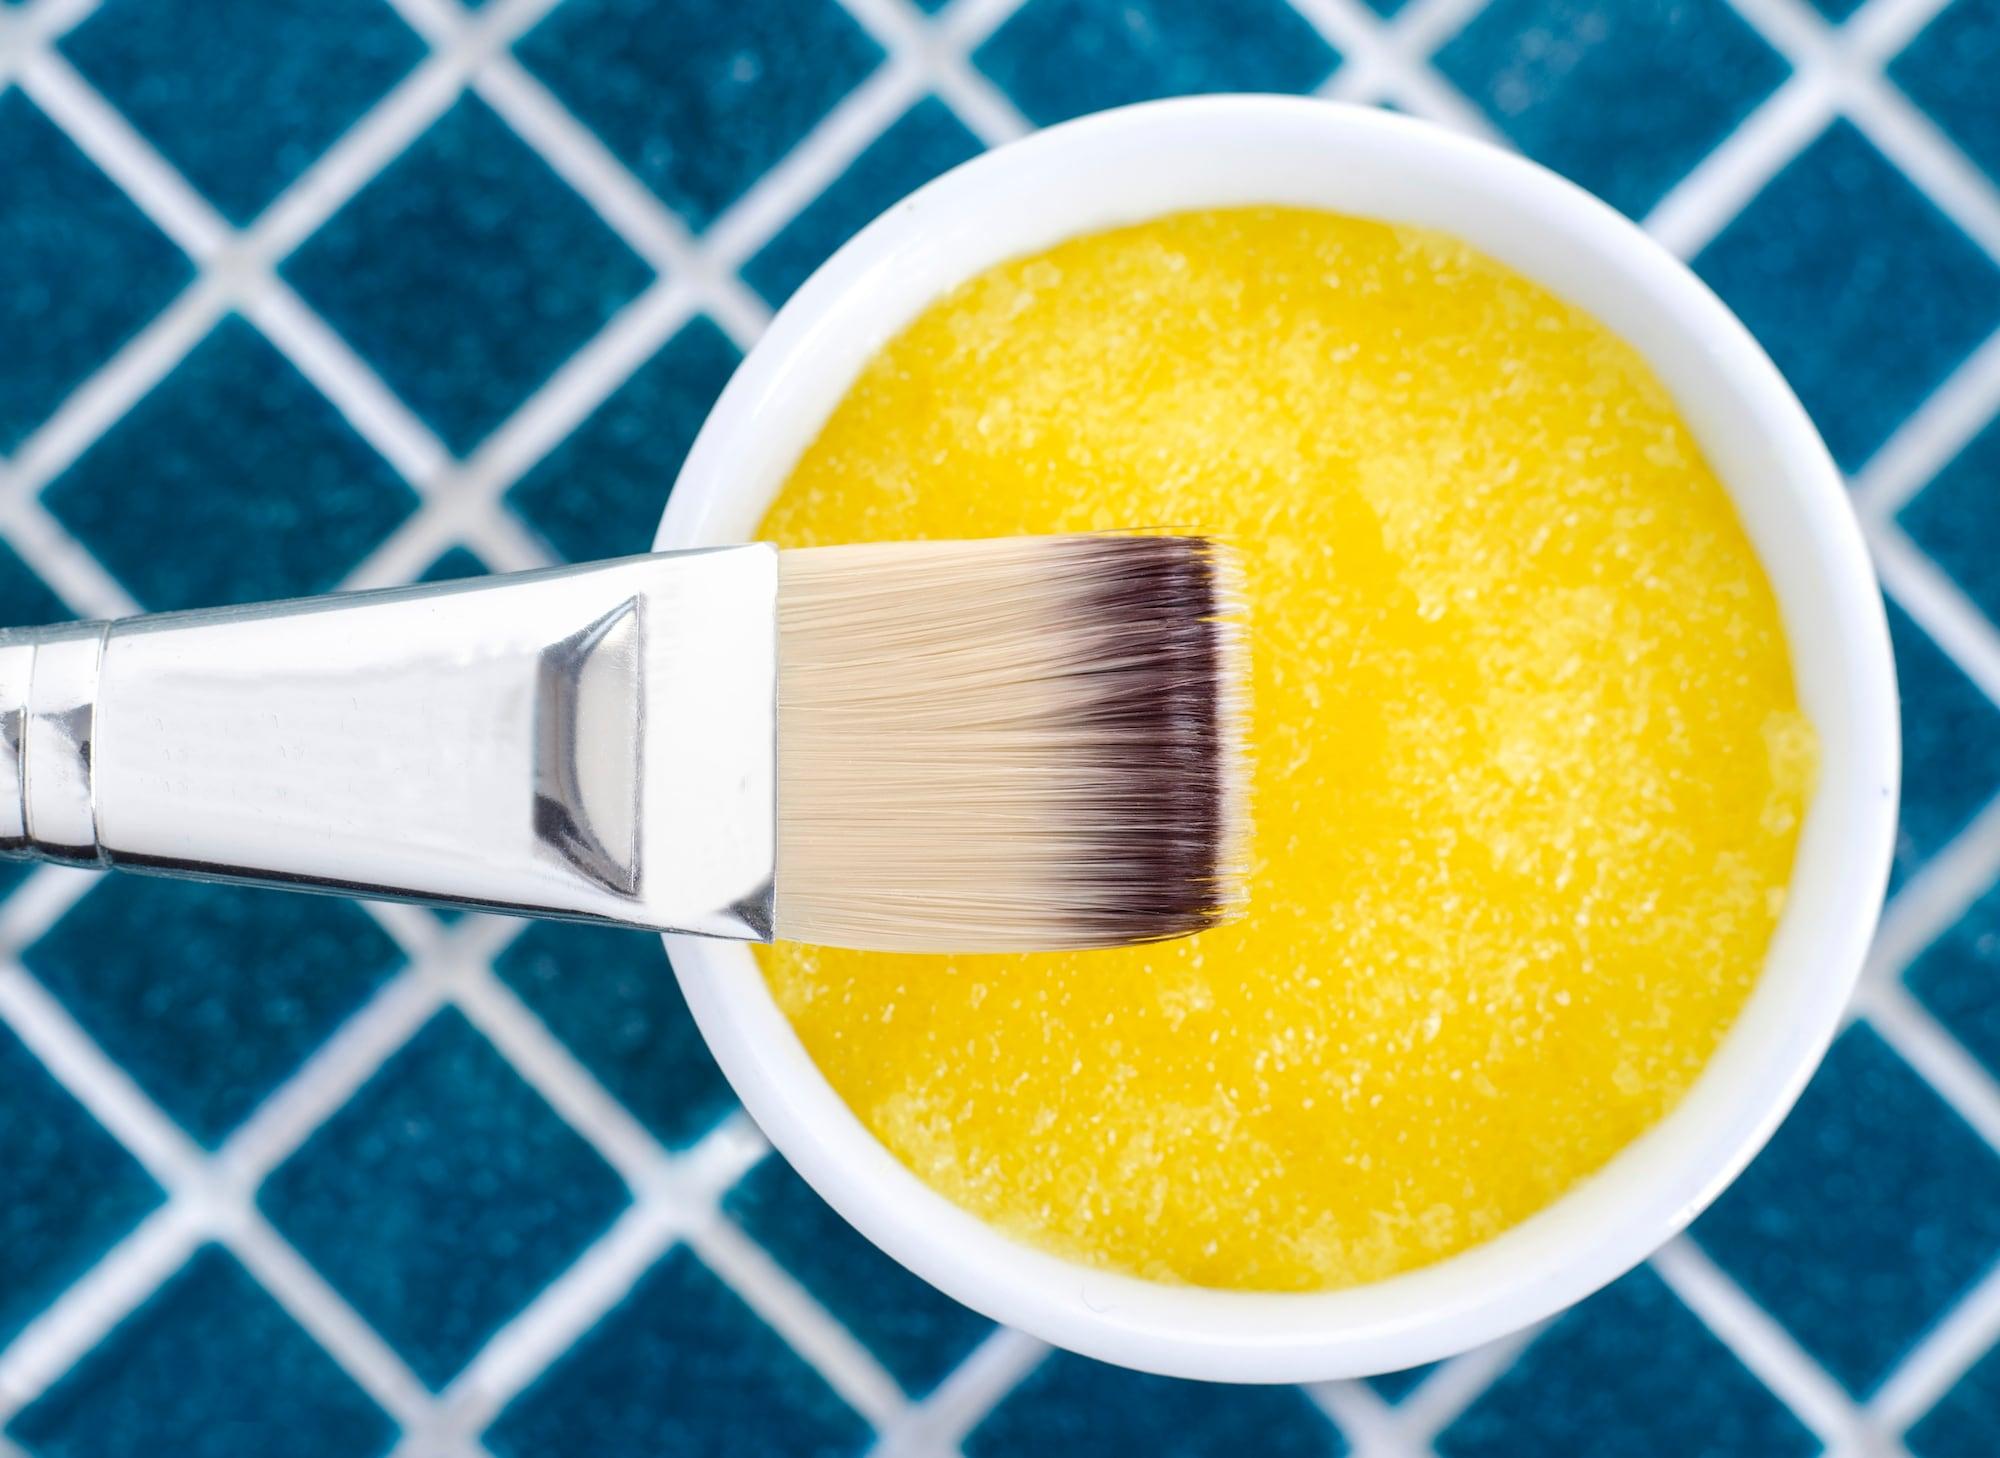 bahan-bahan untuk membuat masker rambut nanas